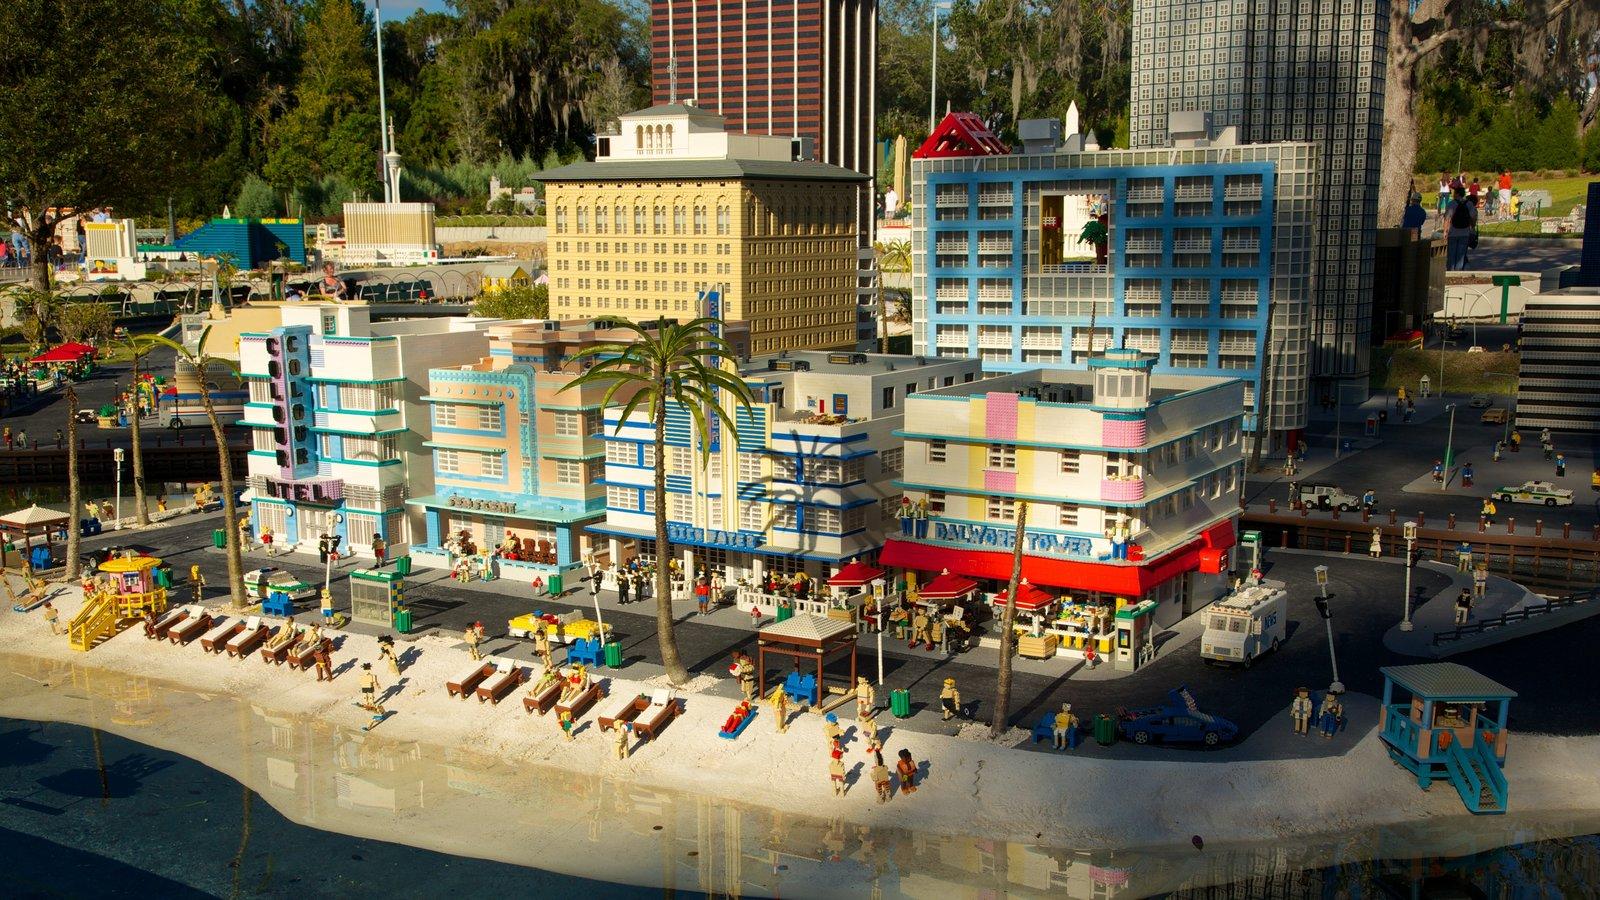 Legoland Florida which includes rides